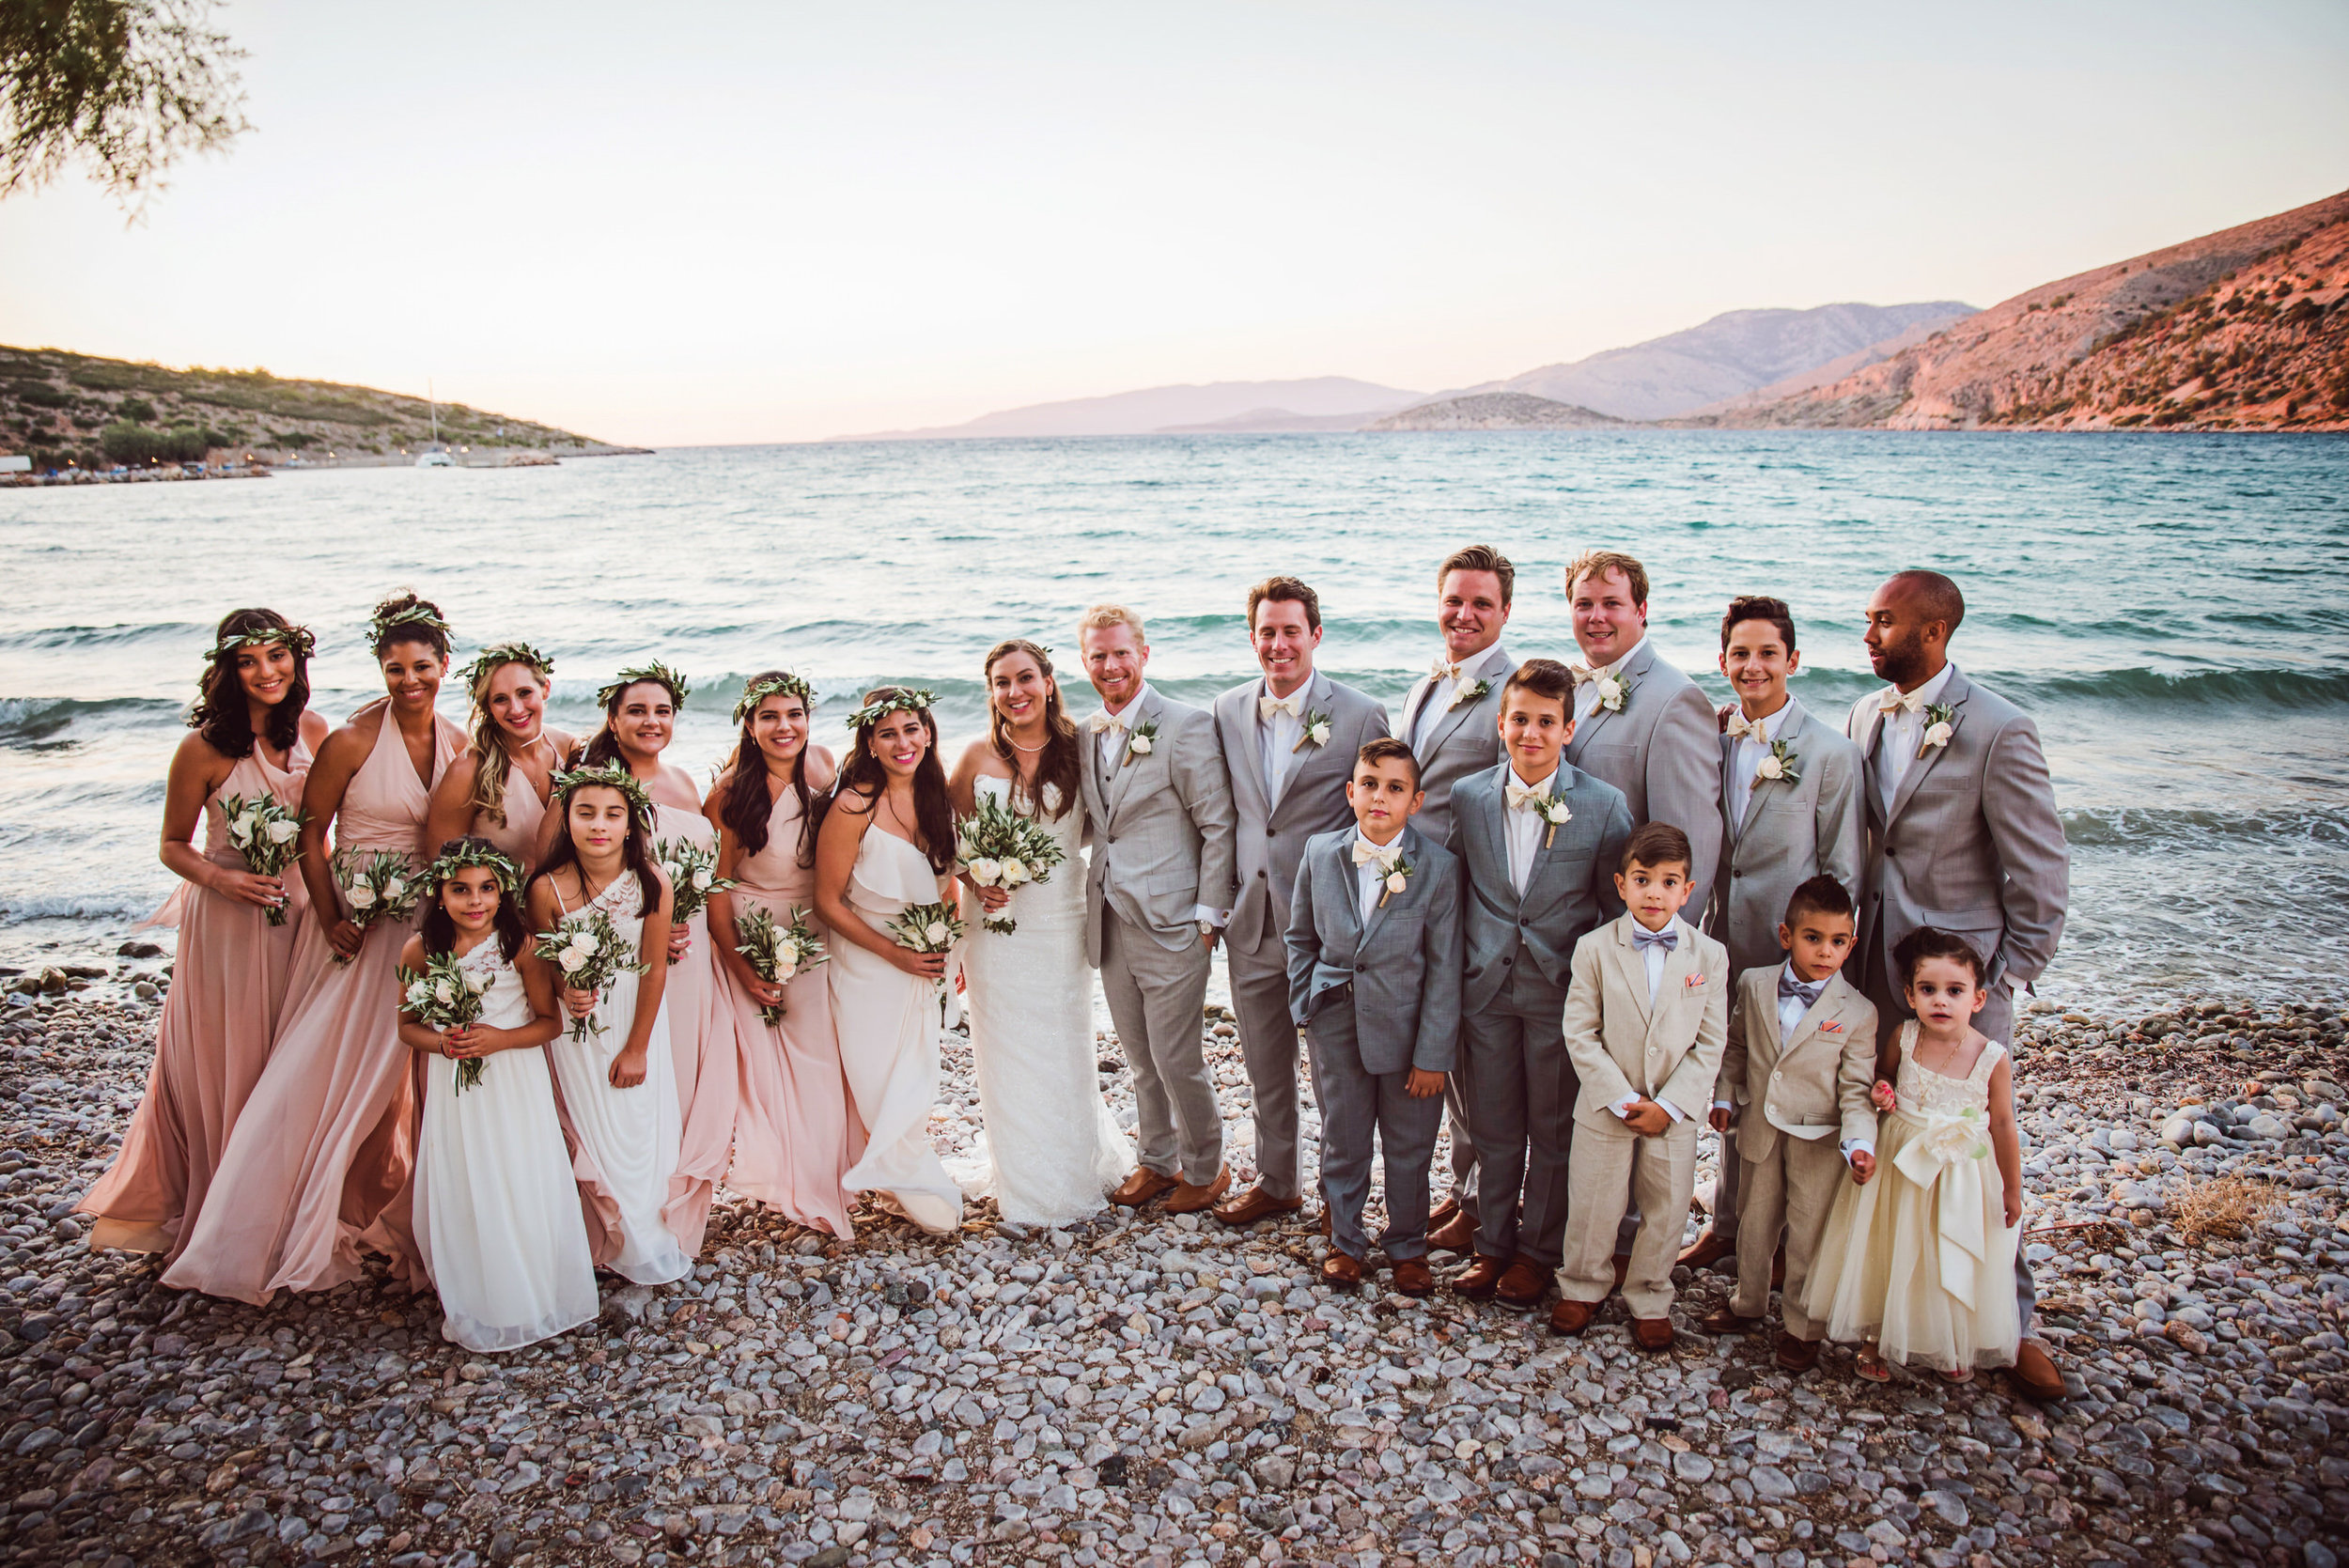 ChiosGreeceWedding-Trisha&Will-WeddingParty-Family-107.jpg